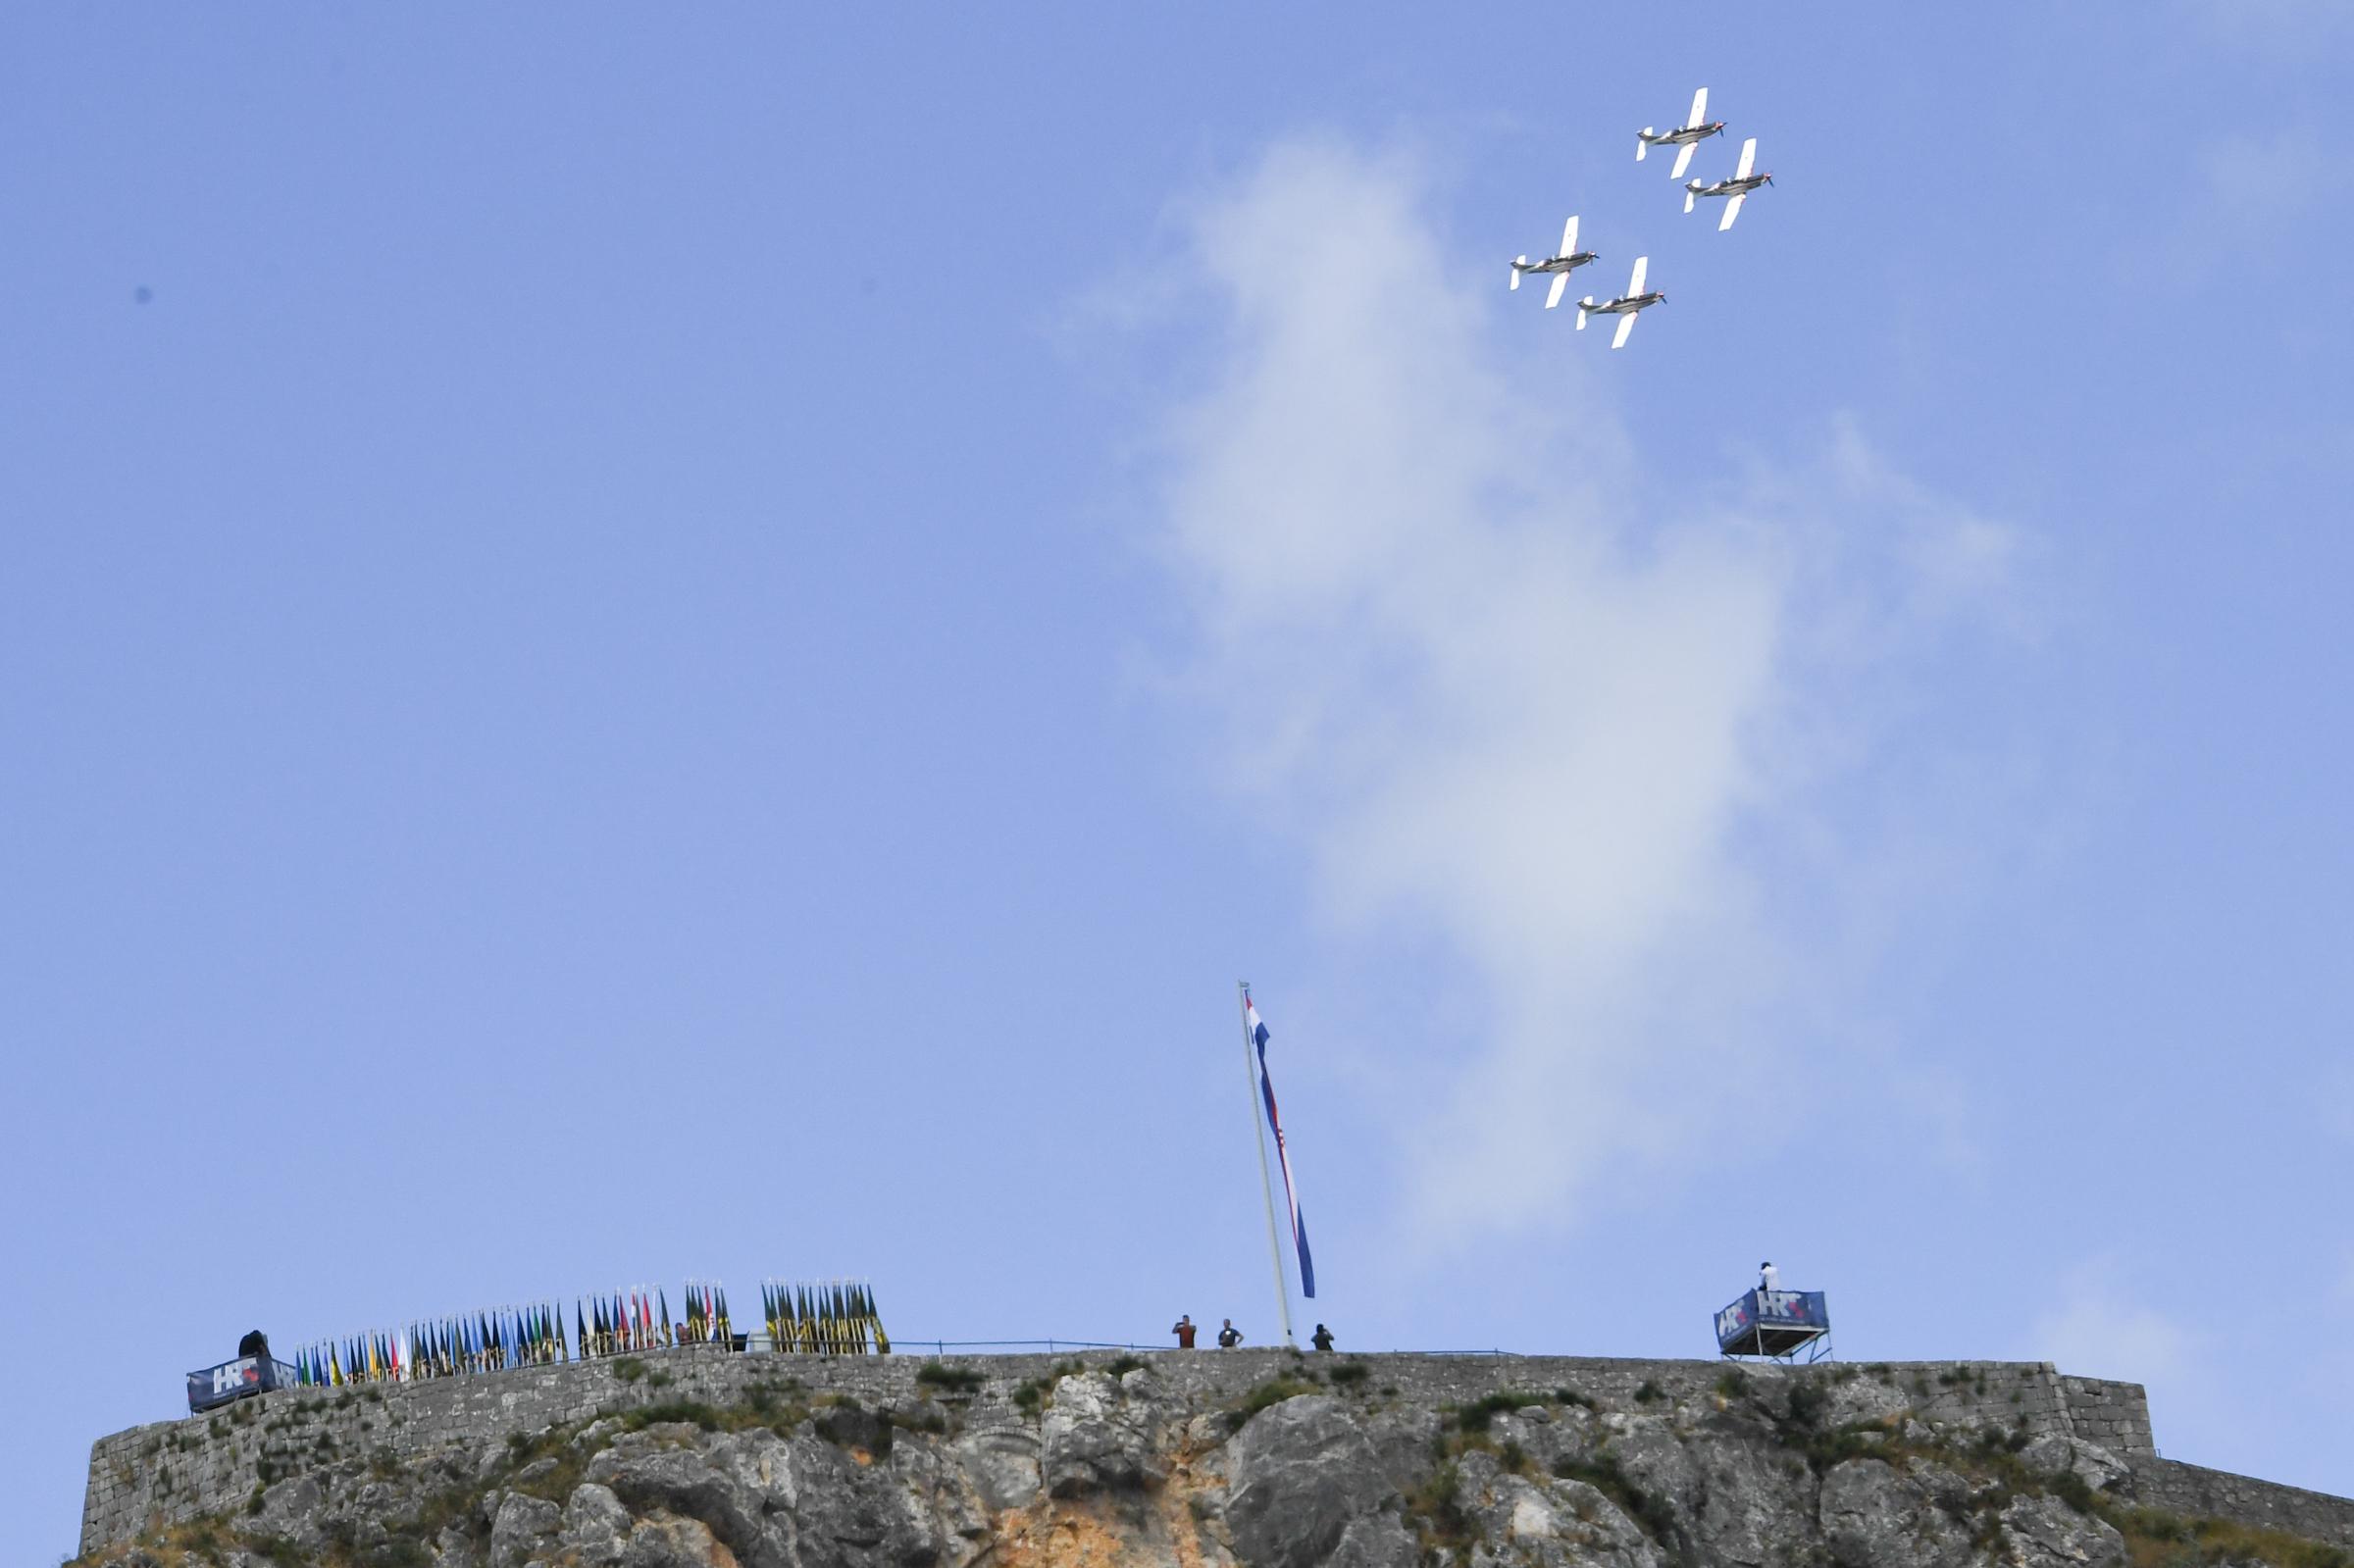 Dan je pobjede i domovinske zahvalnosti, Dan hrvatskih branitelja i 26. obljetnica vojno-redarstvene operacije